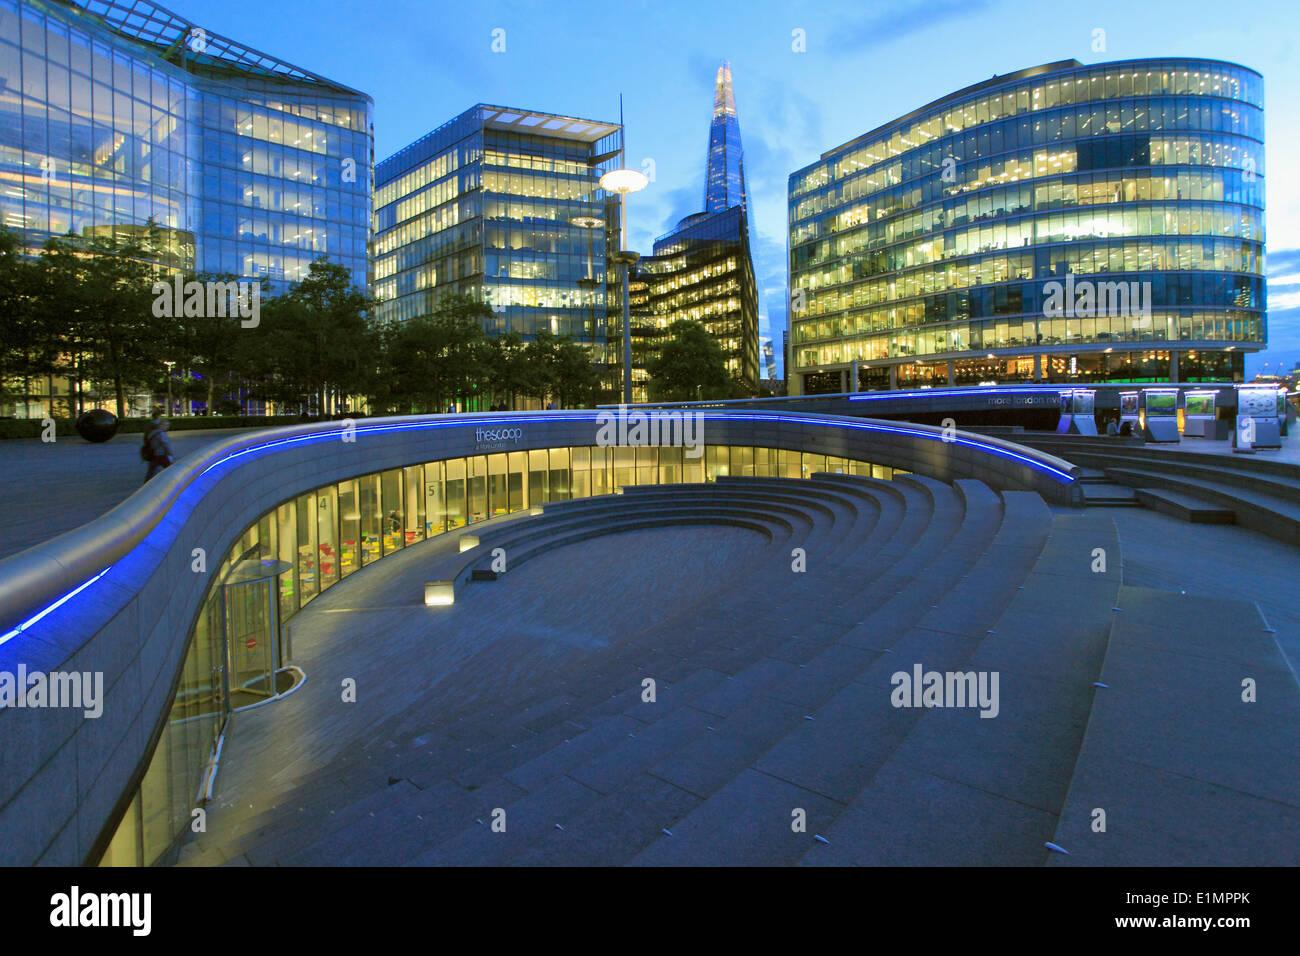 Modern Architecture London England uk, england, london, city hall area, modern architecture, the